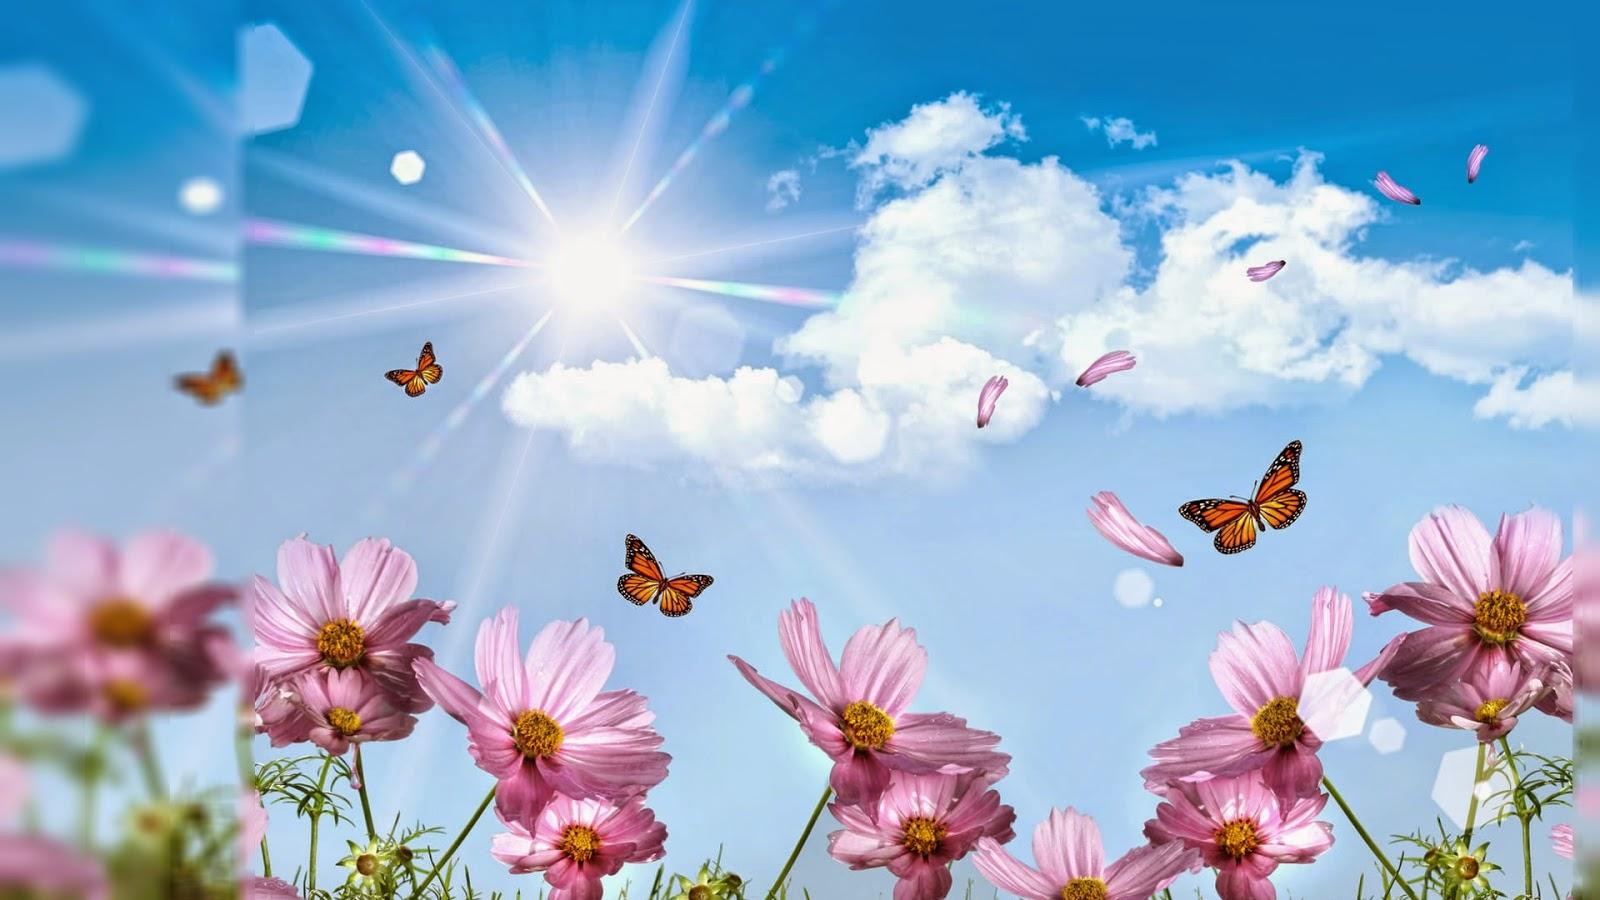 Random Great Flowers Wallpaper Desktop Background Full Screen 1600x900